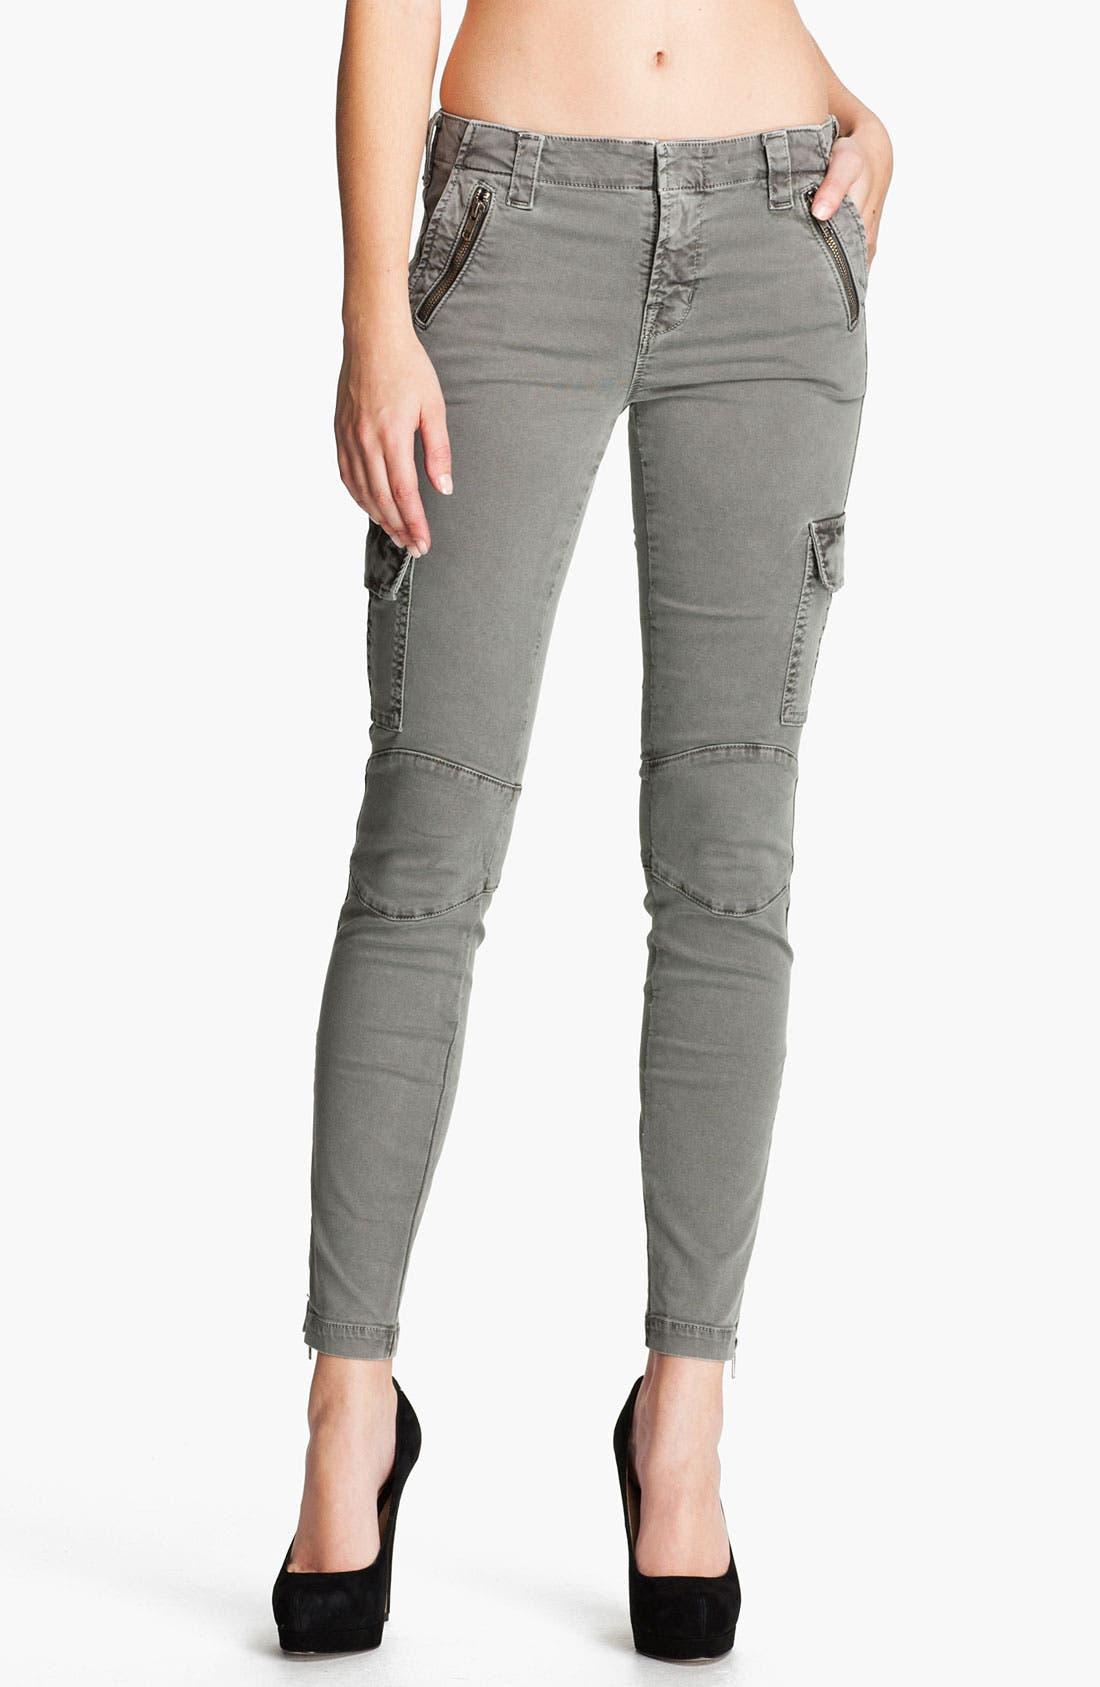 Alternate Image 1 Selected - J Brand 'Maverick' Cargo Pants